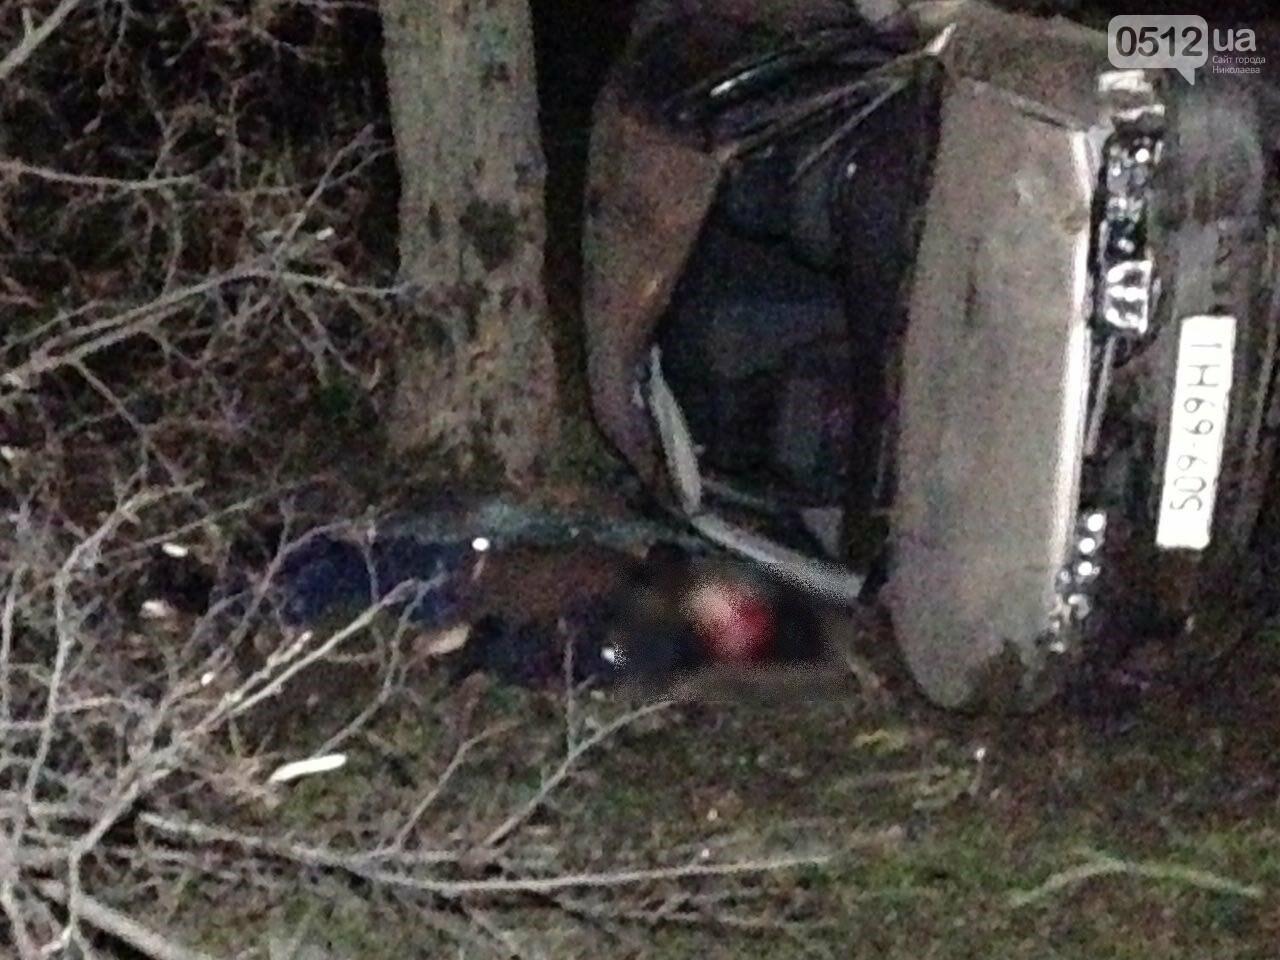 Страшное ДТП в Николаеве: 2 парня и 2 девушки на Мазде влетели в дерево - водитель умер на месте аварии, - ФОТО, фото-7